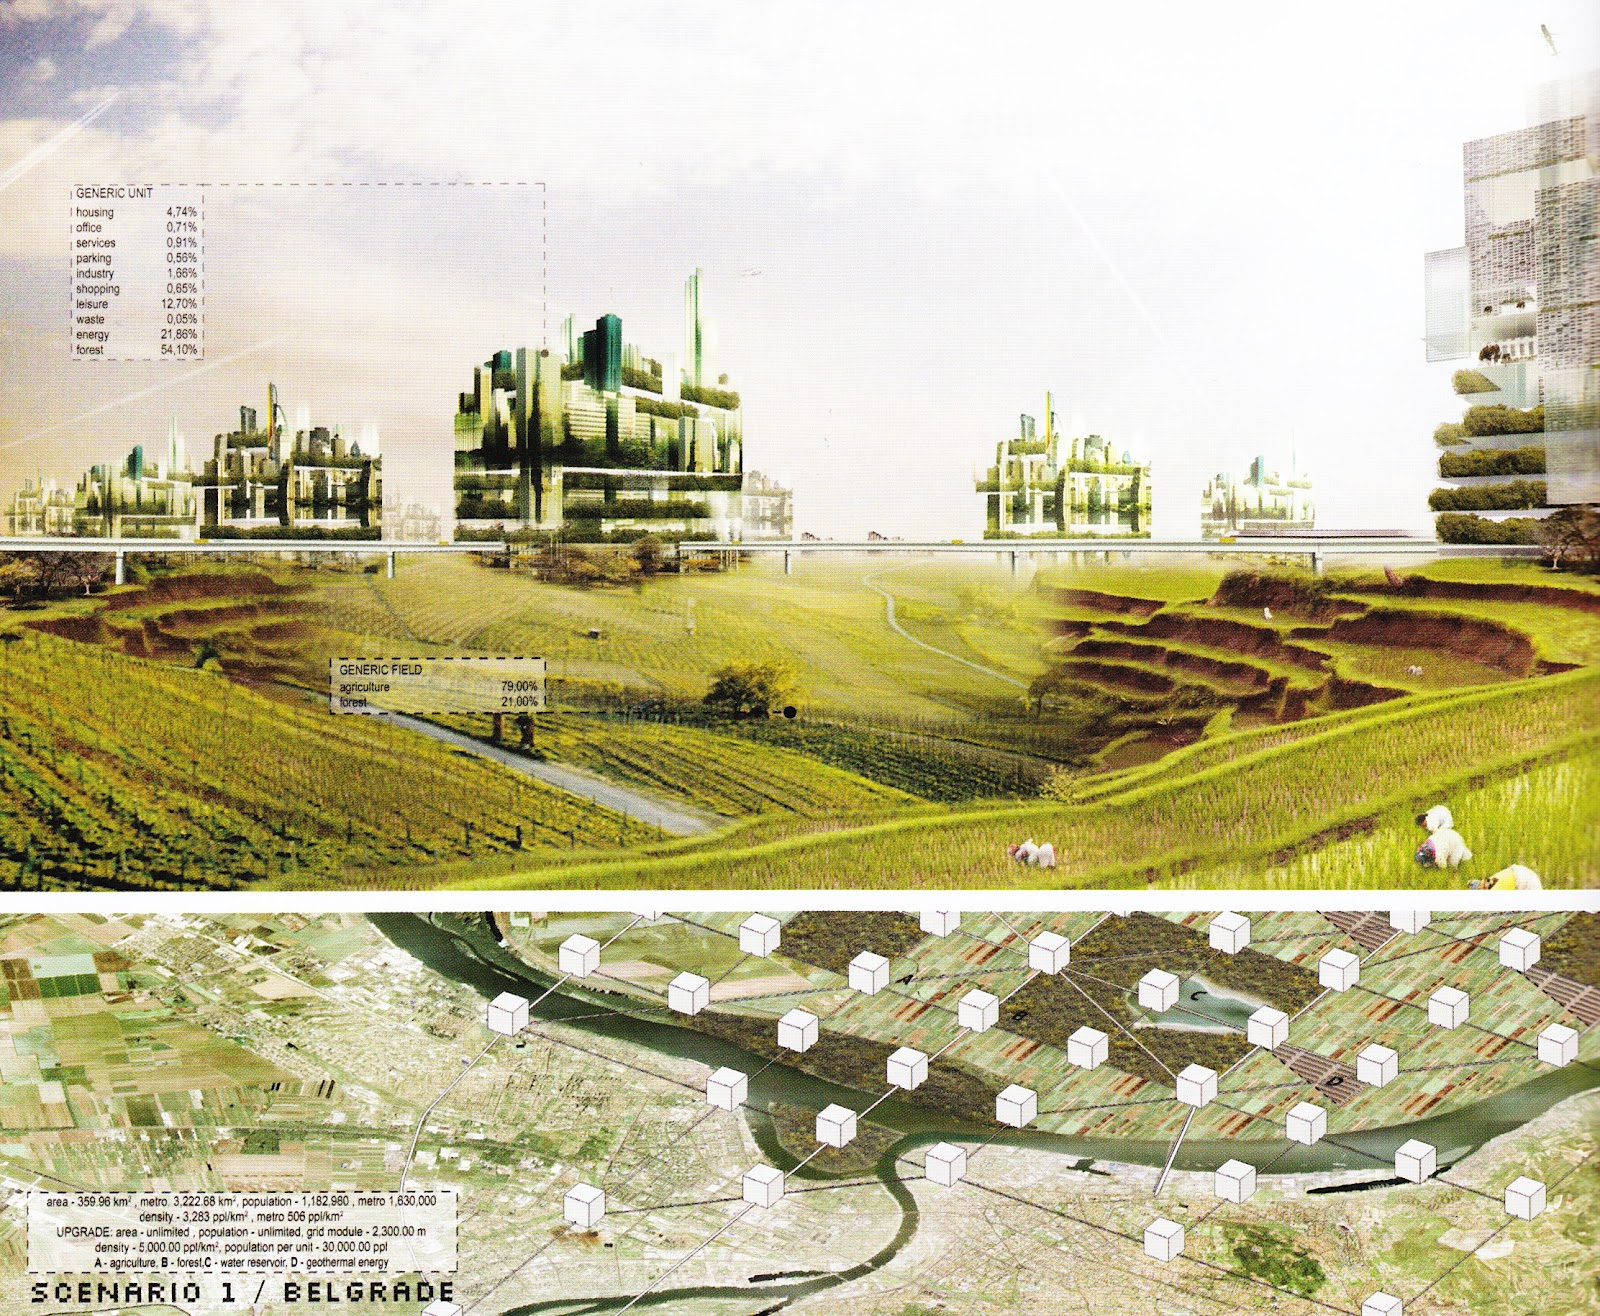 2025 suburban design august 2012 tuesday 28 august 2012